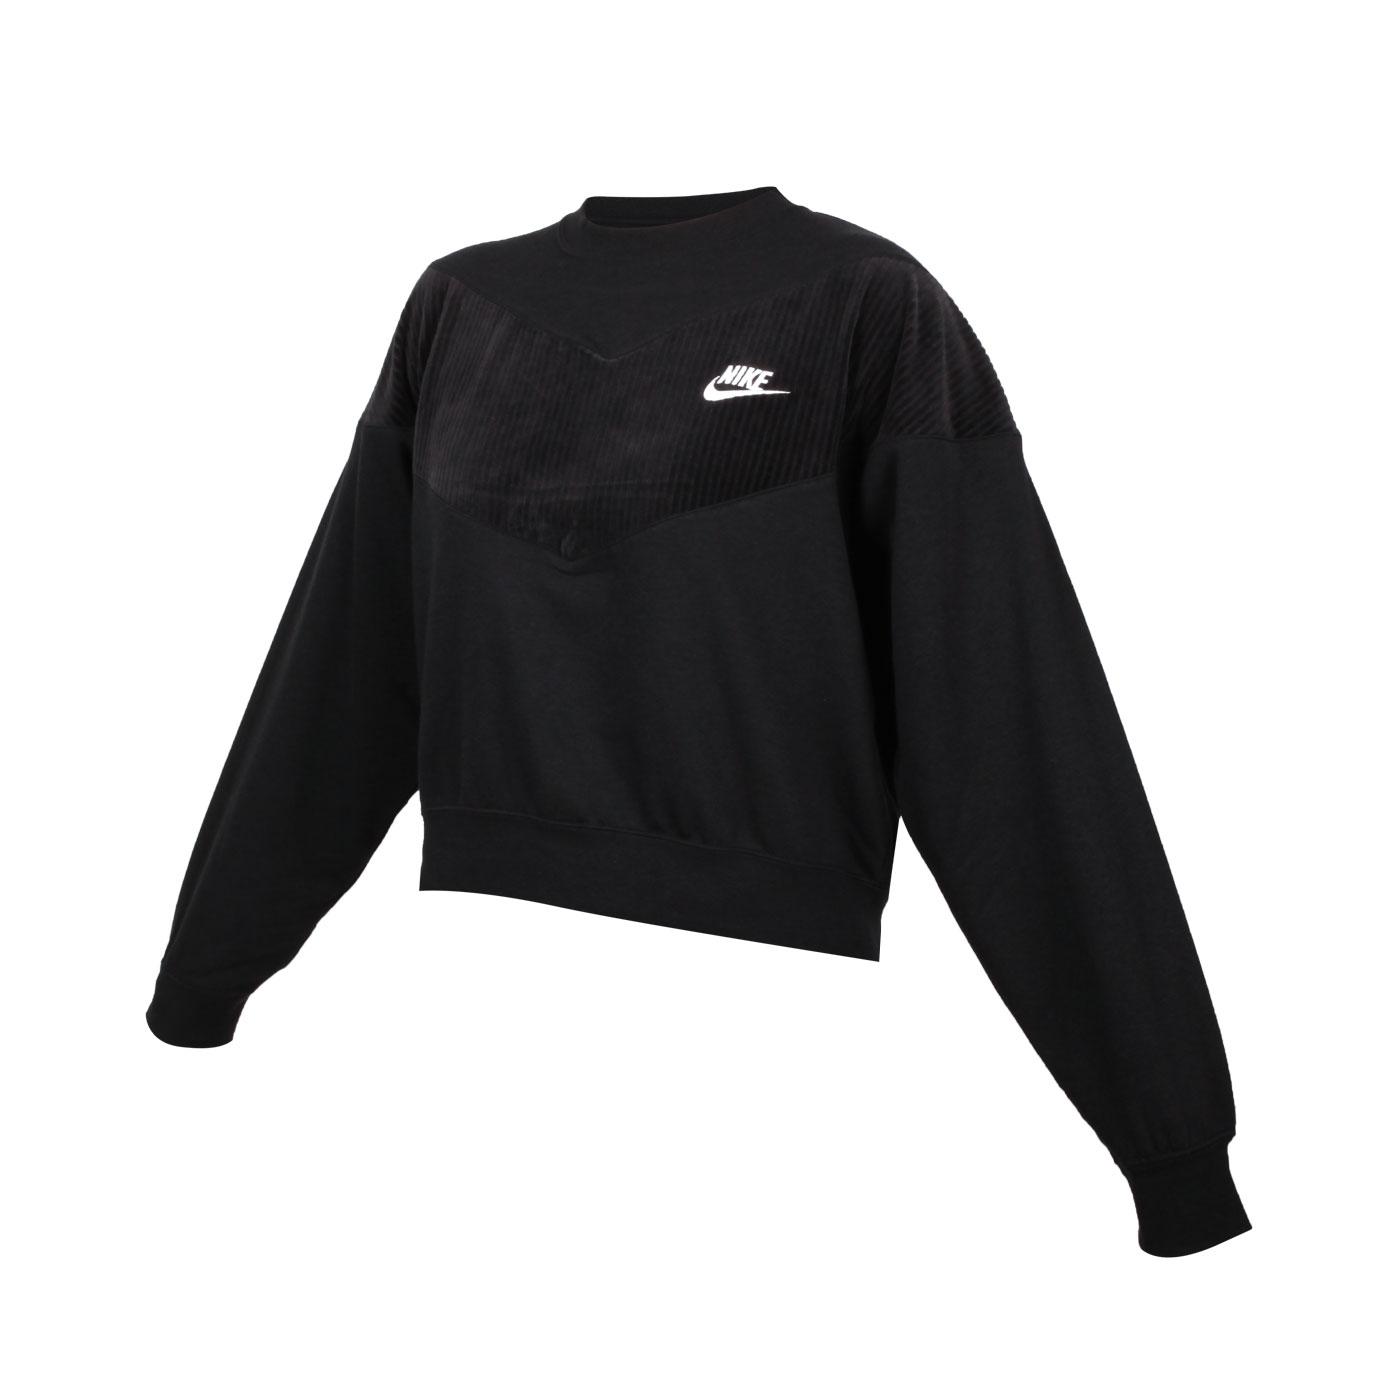 NIKE 女款長袖T恤 CZ1877-010 - 黑白